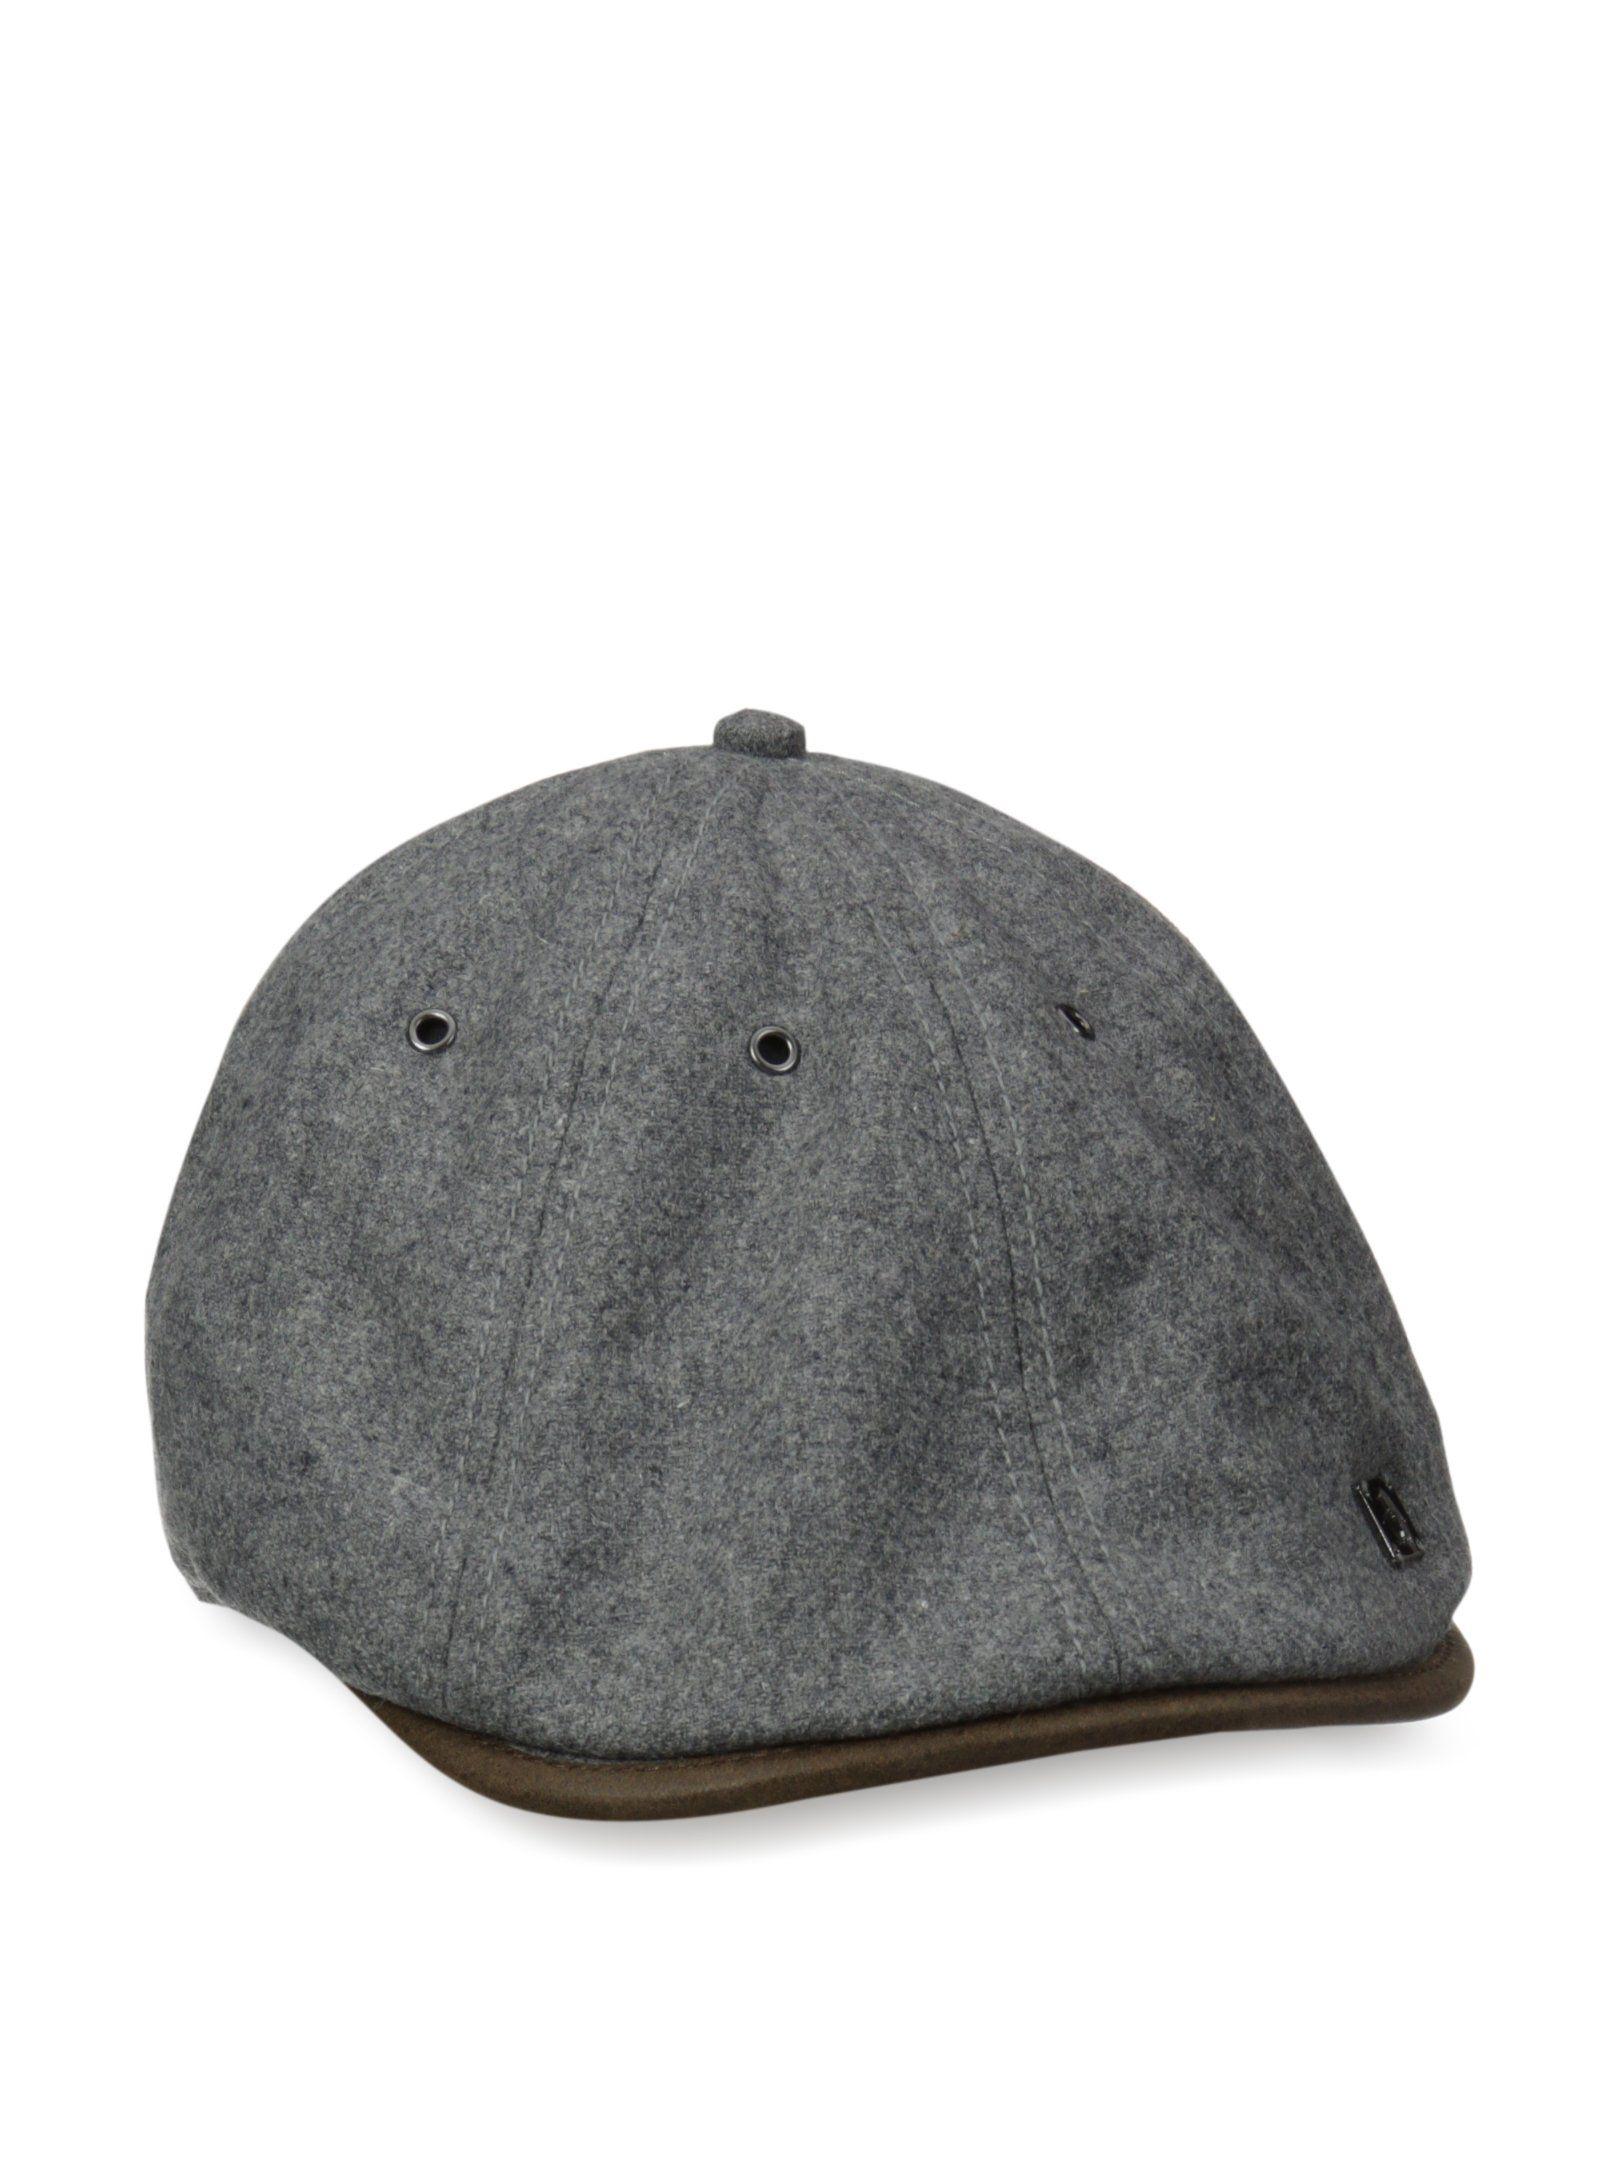 72eaa72f Original Penguin Men's Felted Wool 6 Panel Drive Hat at MYHABIT ...